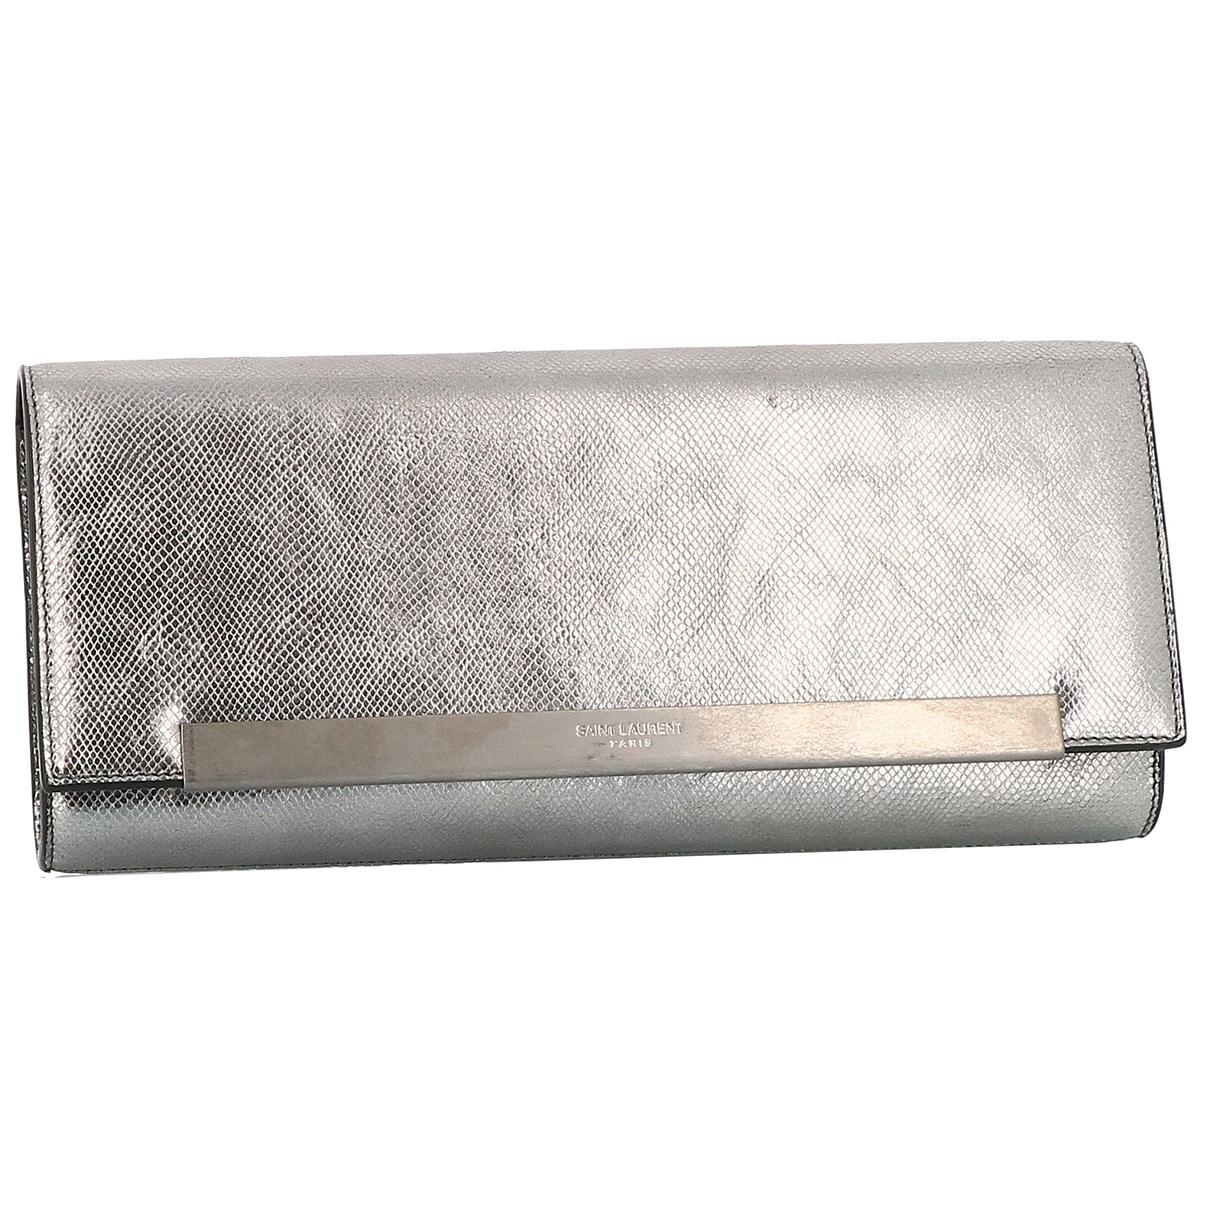 Saint Laurent \N Clutch in  Silber Leder